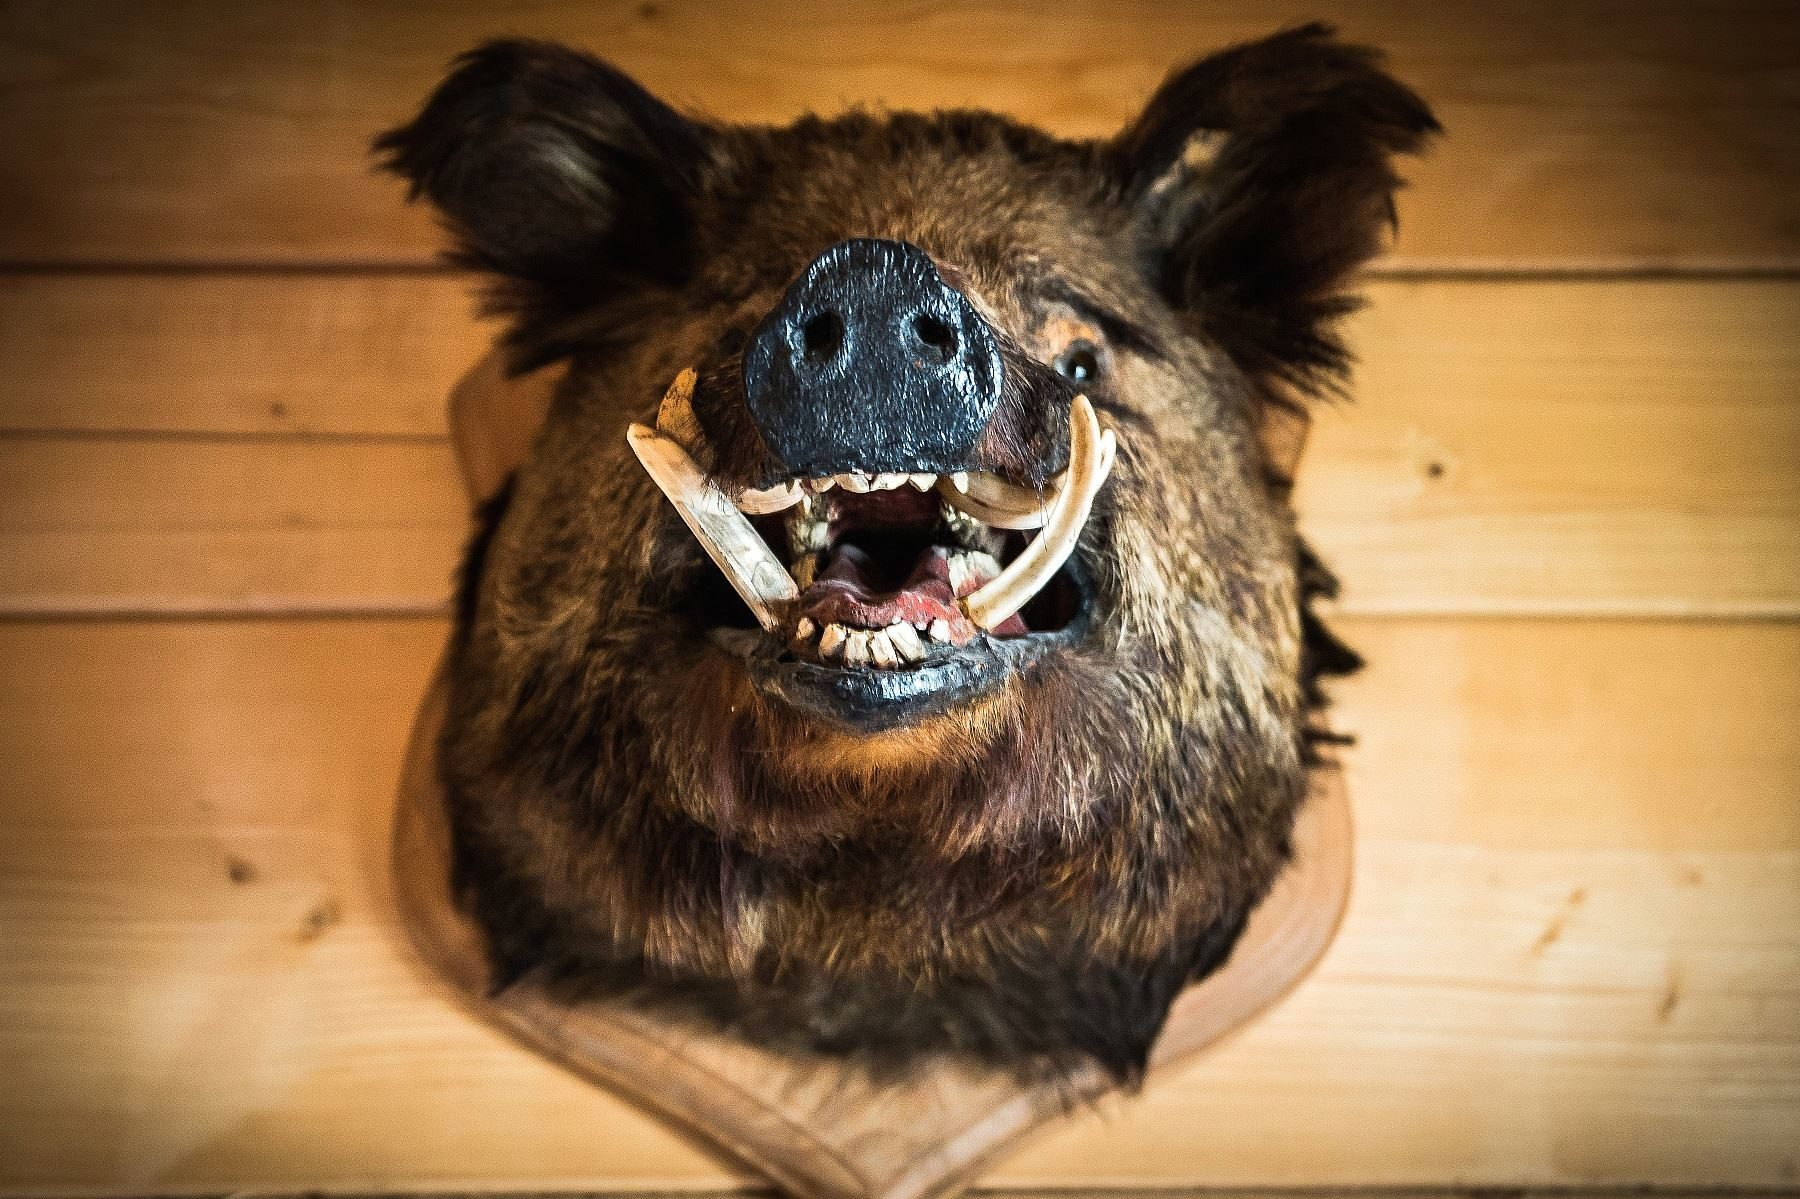 Image libre Sanglier dfense fourrure trophe chasse animal sauvage animal